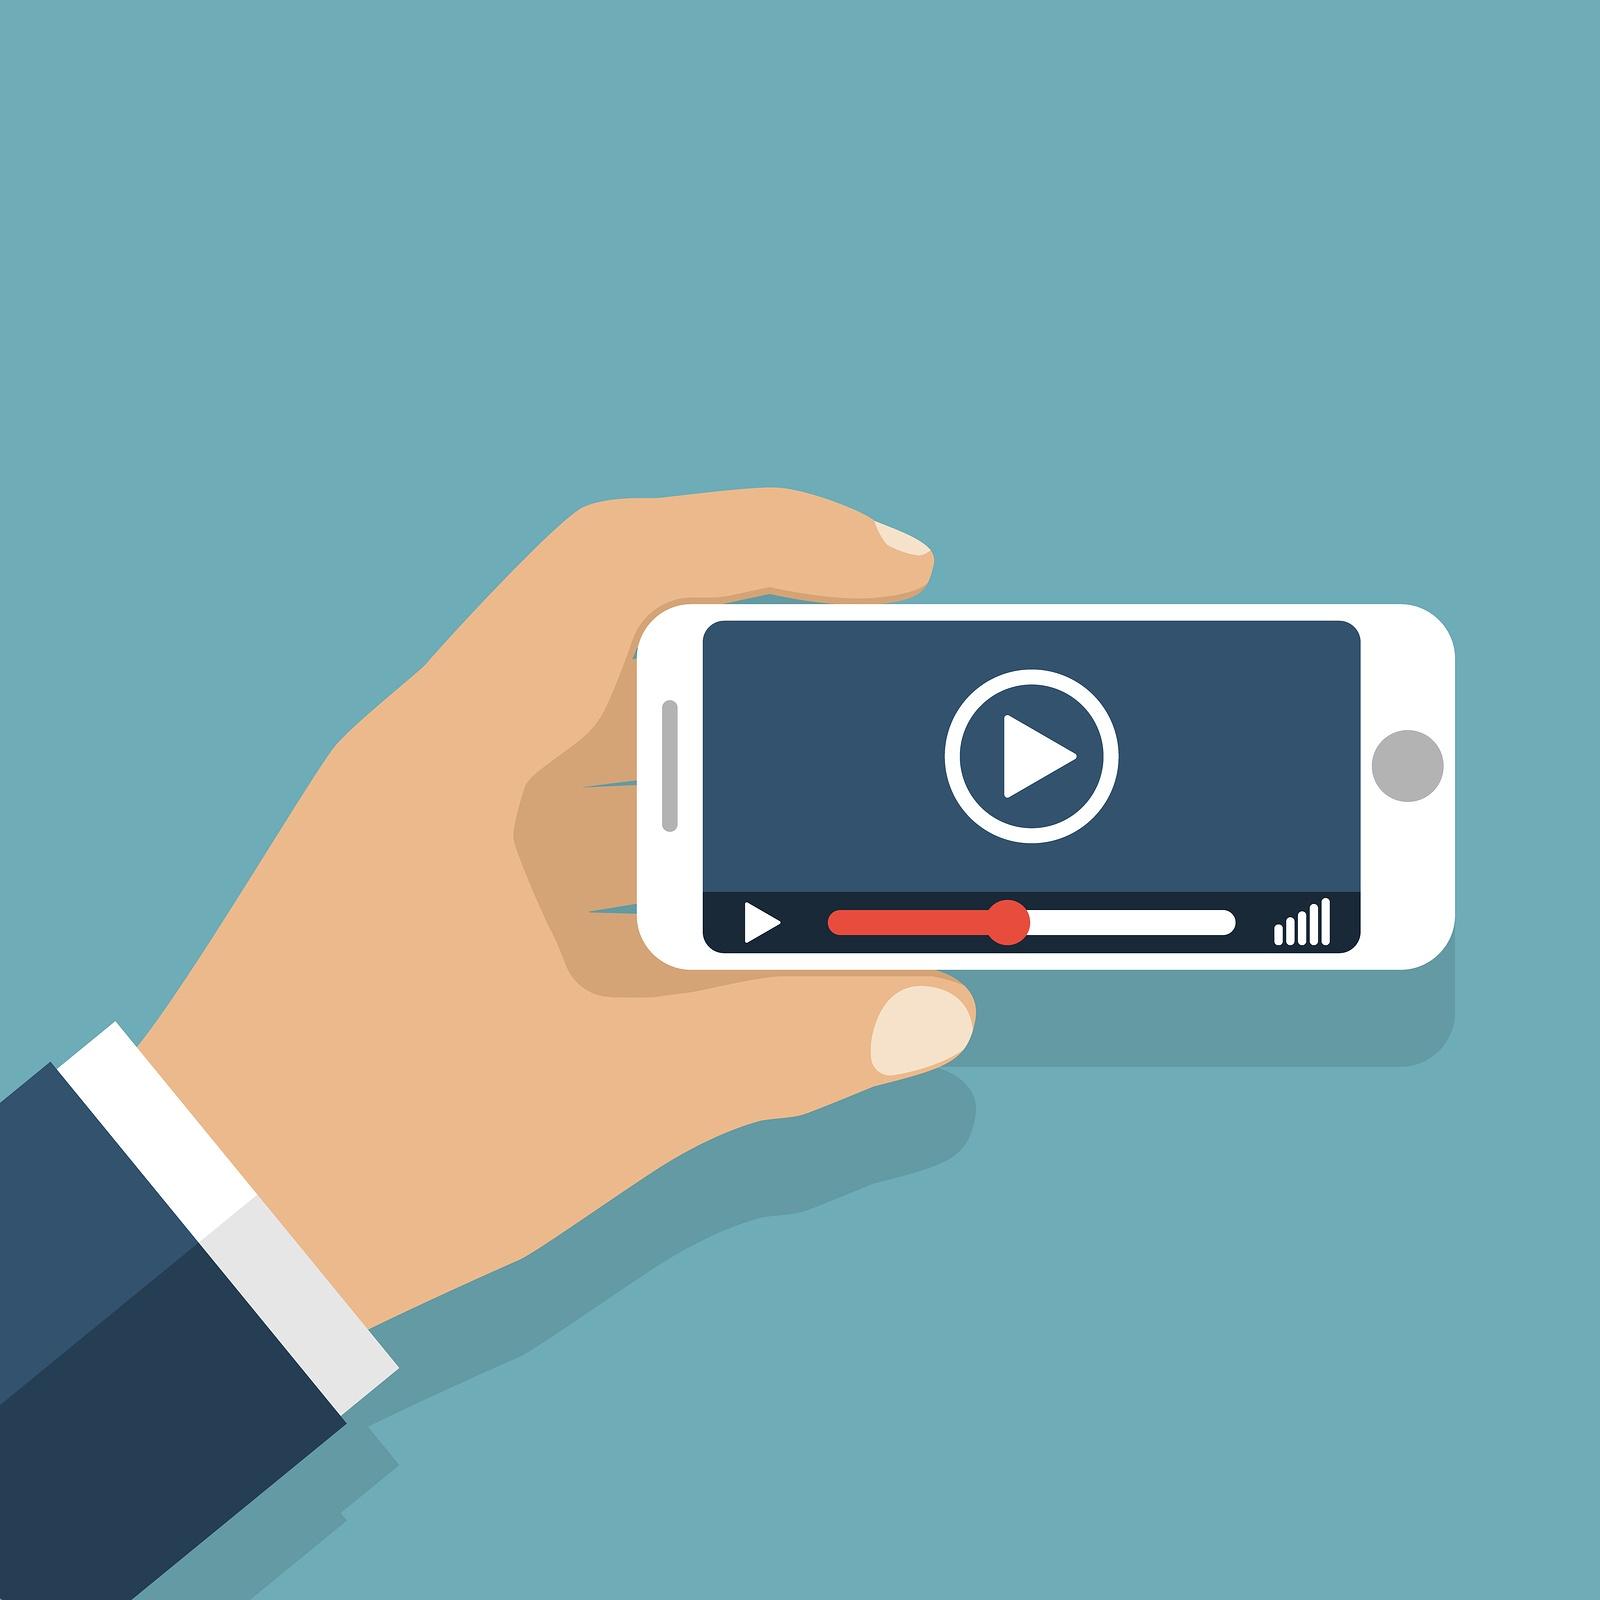 bigstock-Hand-Holds-Smartphone-Video-P-120737783.jpg